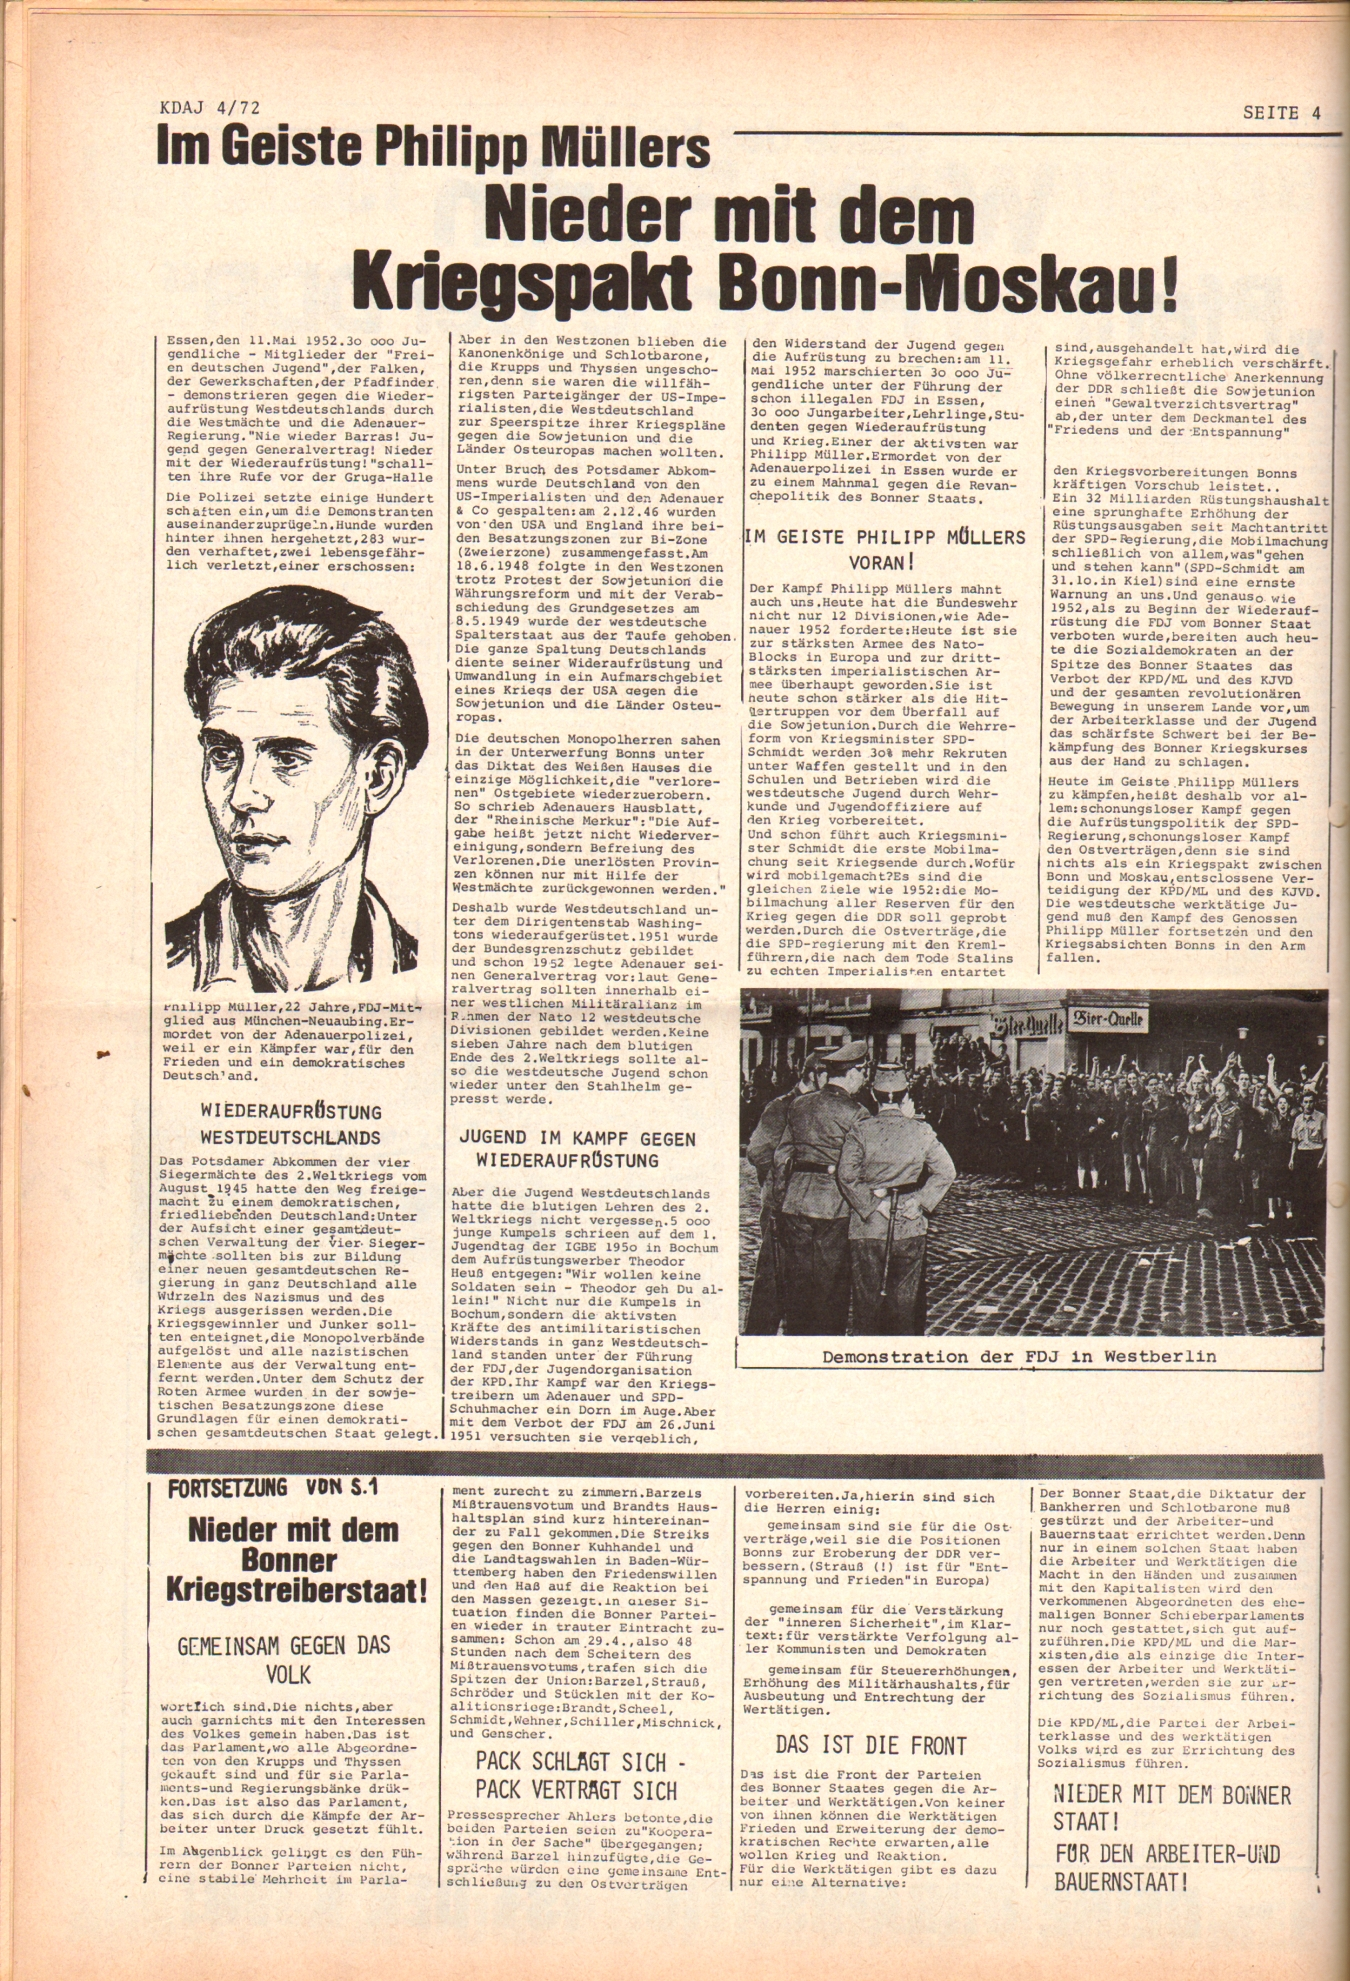 KDAJ, 3. Jg., Mai 1972, Nr. 4, Seite 4